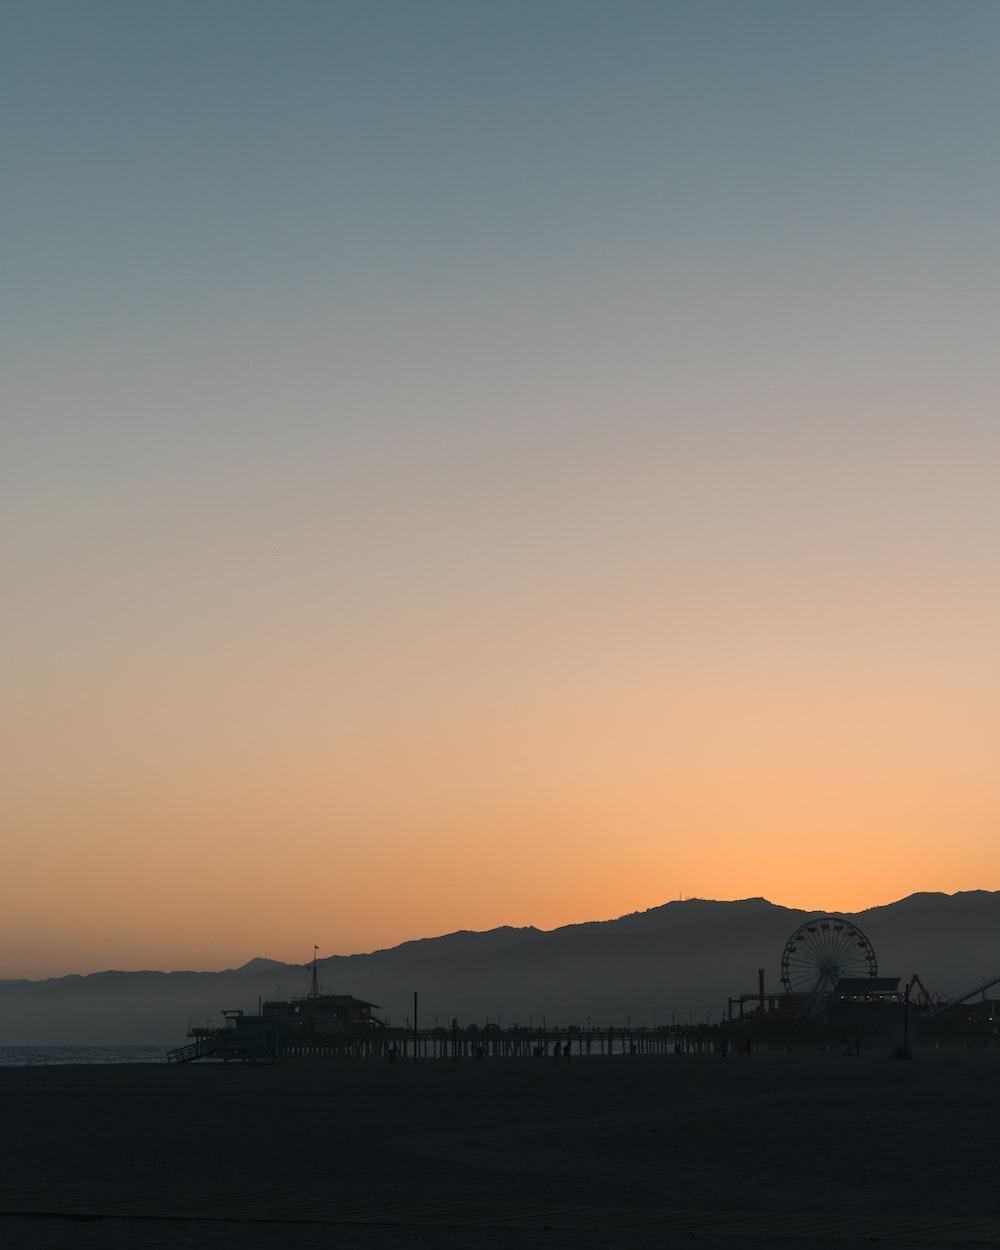 silhouette of Ferris wheel near mountains